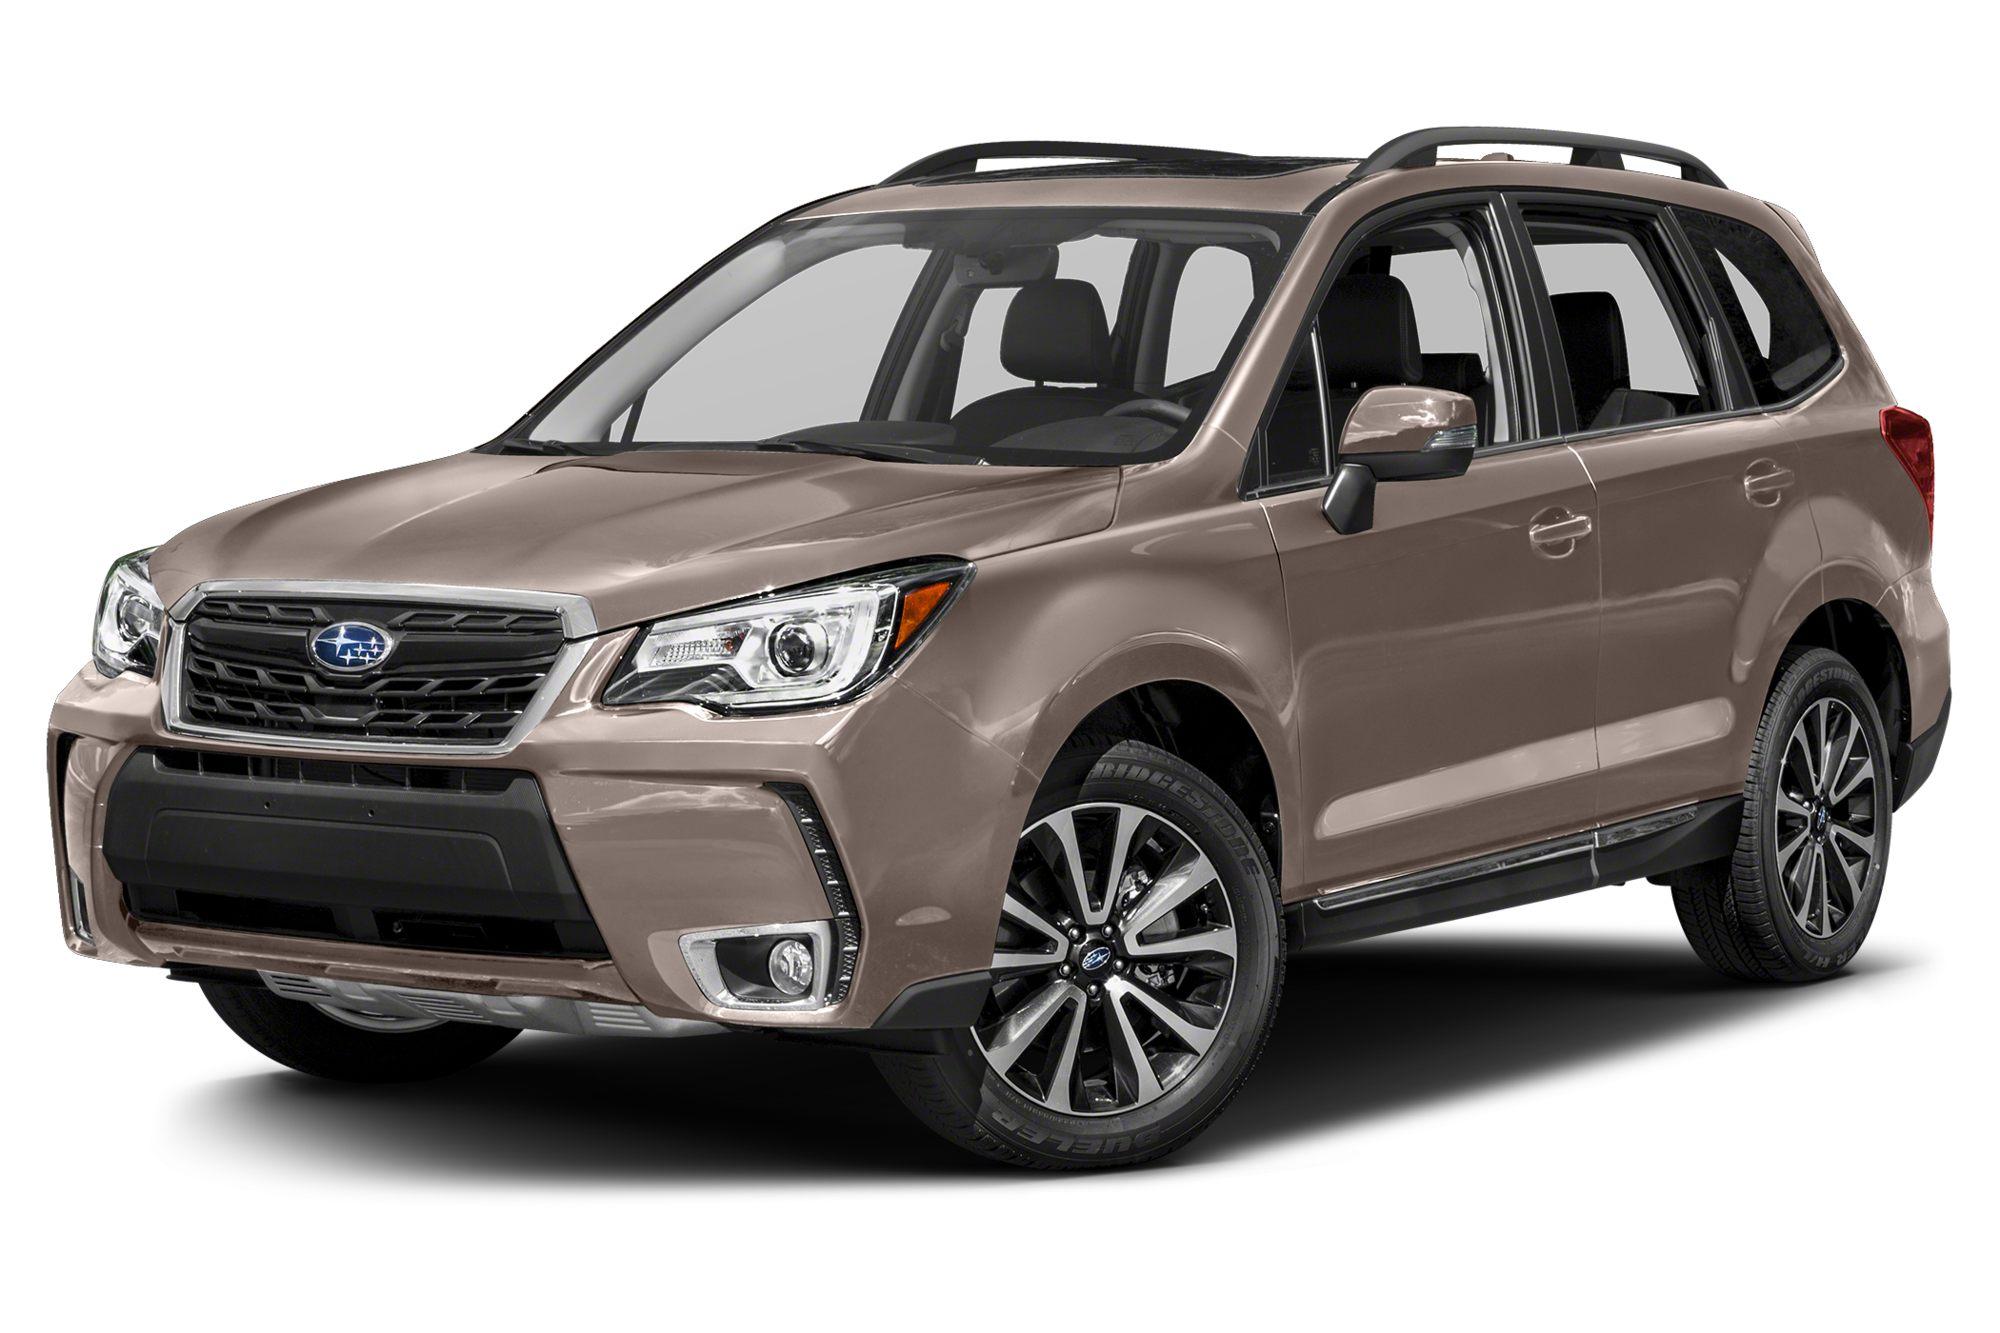 2015-2018 Subaru Forester: Recall Alert